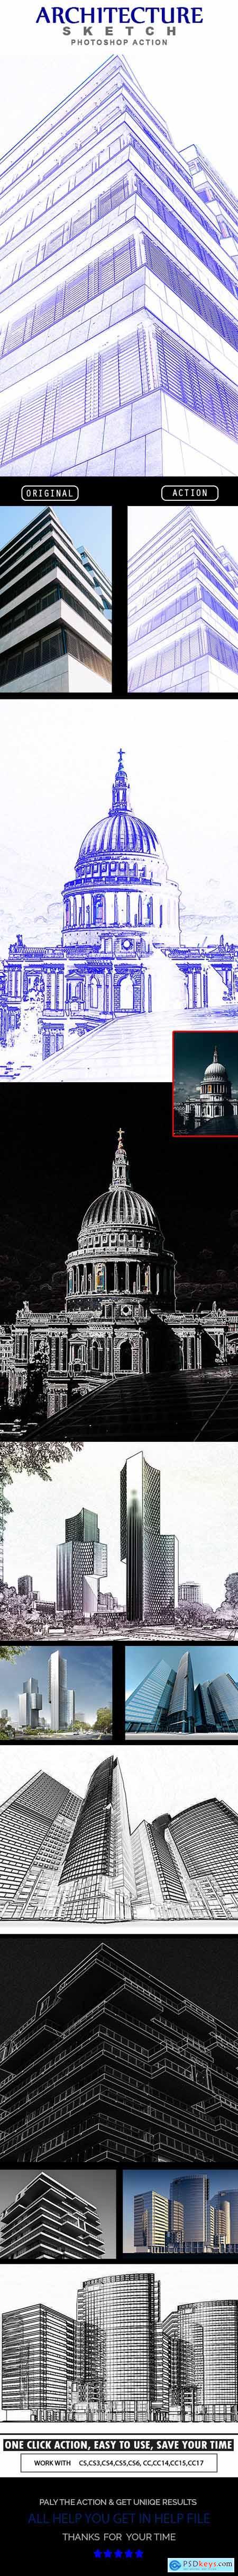 Architecture Sketch Photoshop Action 24965106